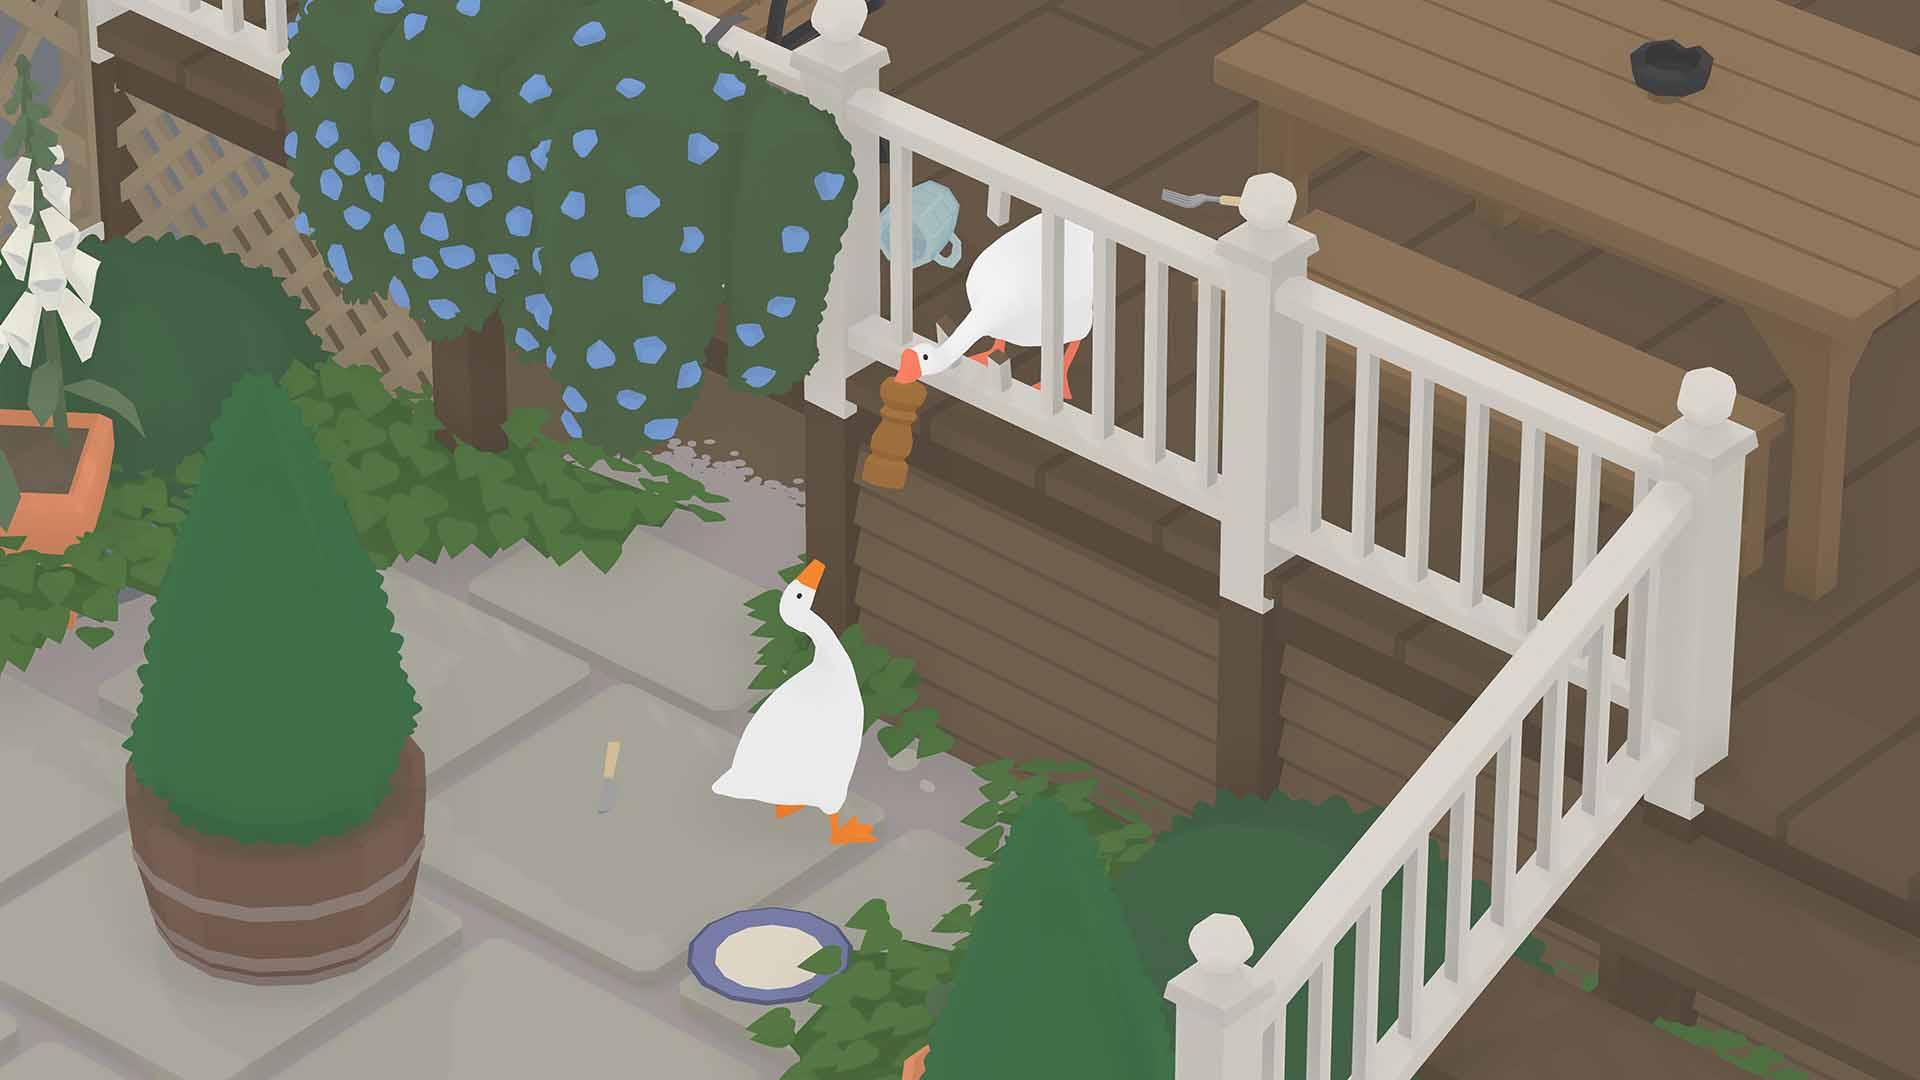 download-Untitled-Goose-Game-hadoan-tv-3